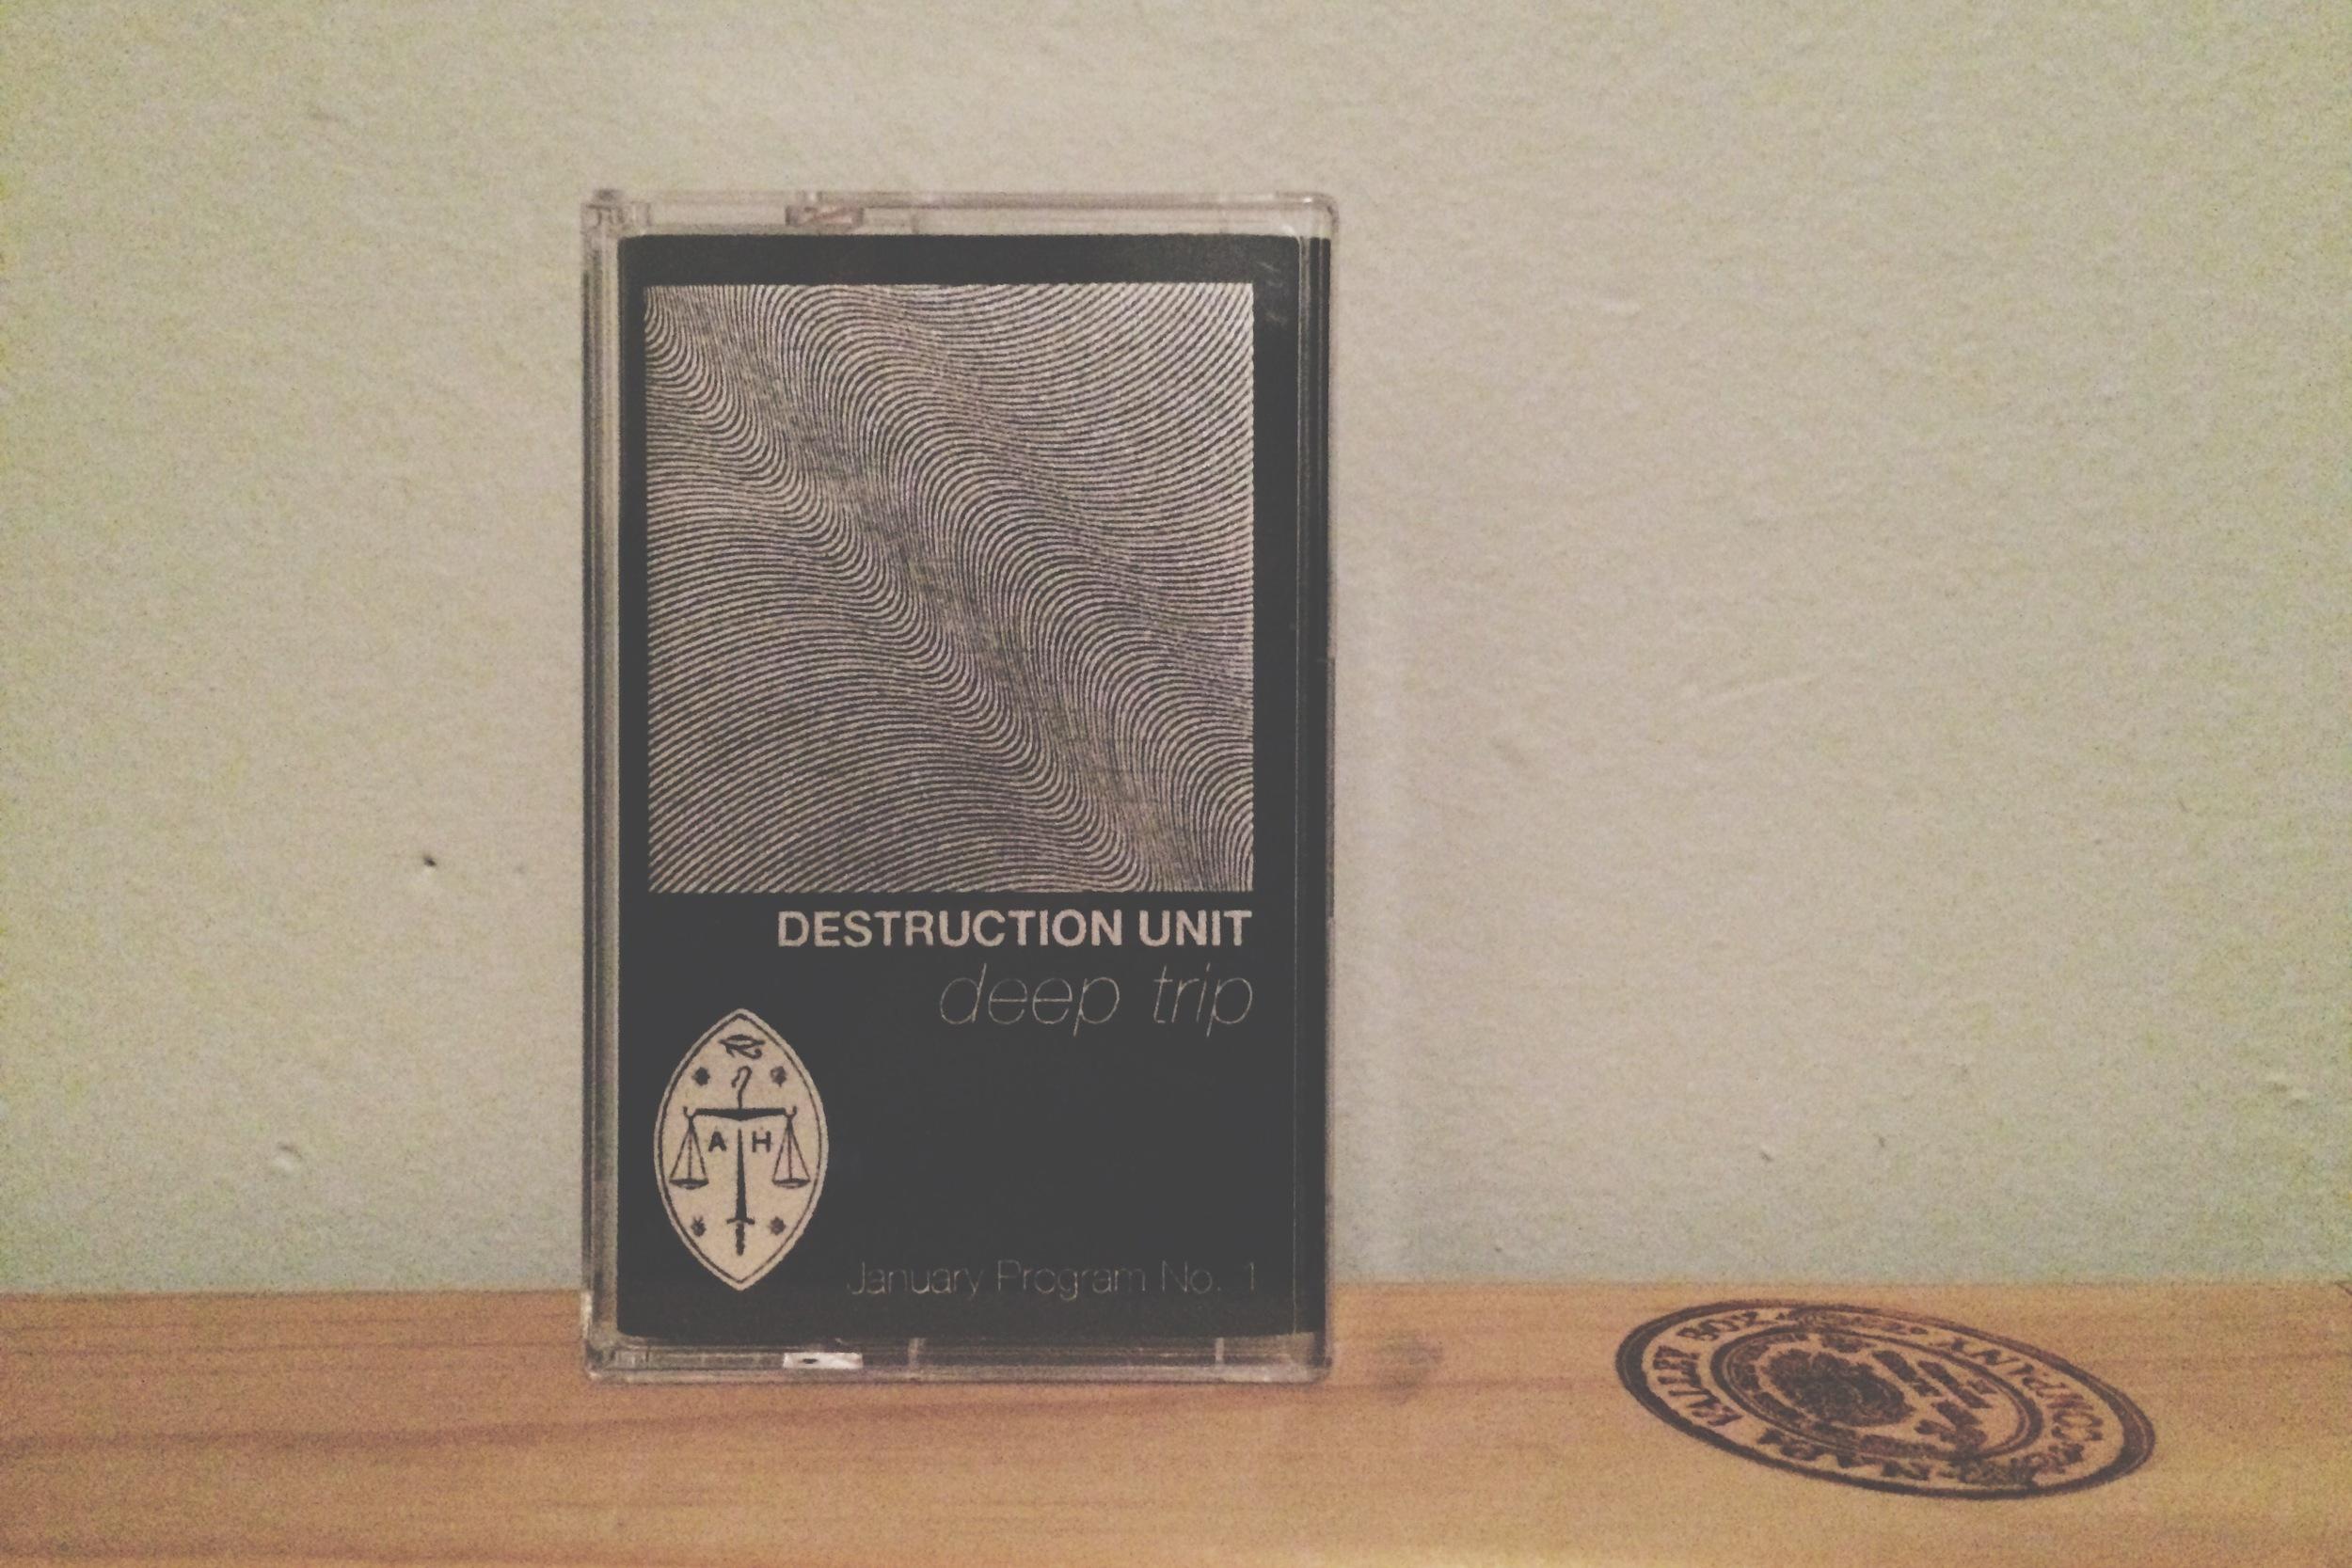 1 03. Destruction Unit - Deep Trip.jpg